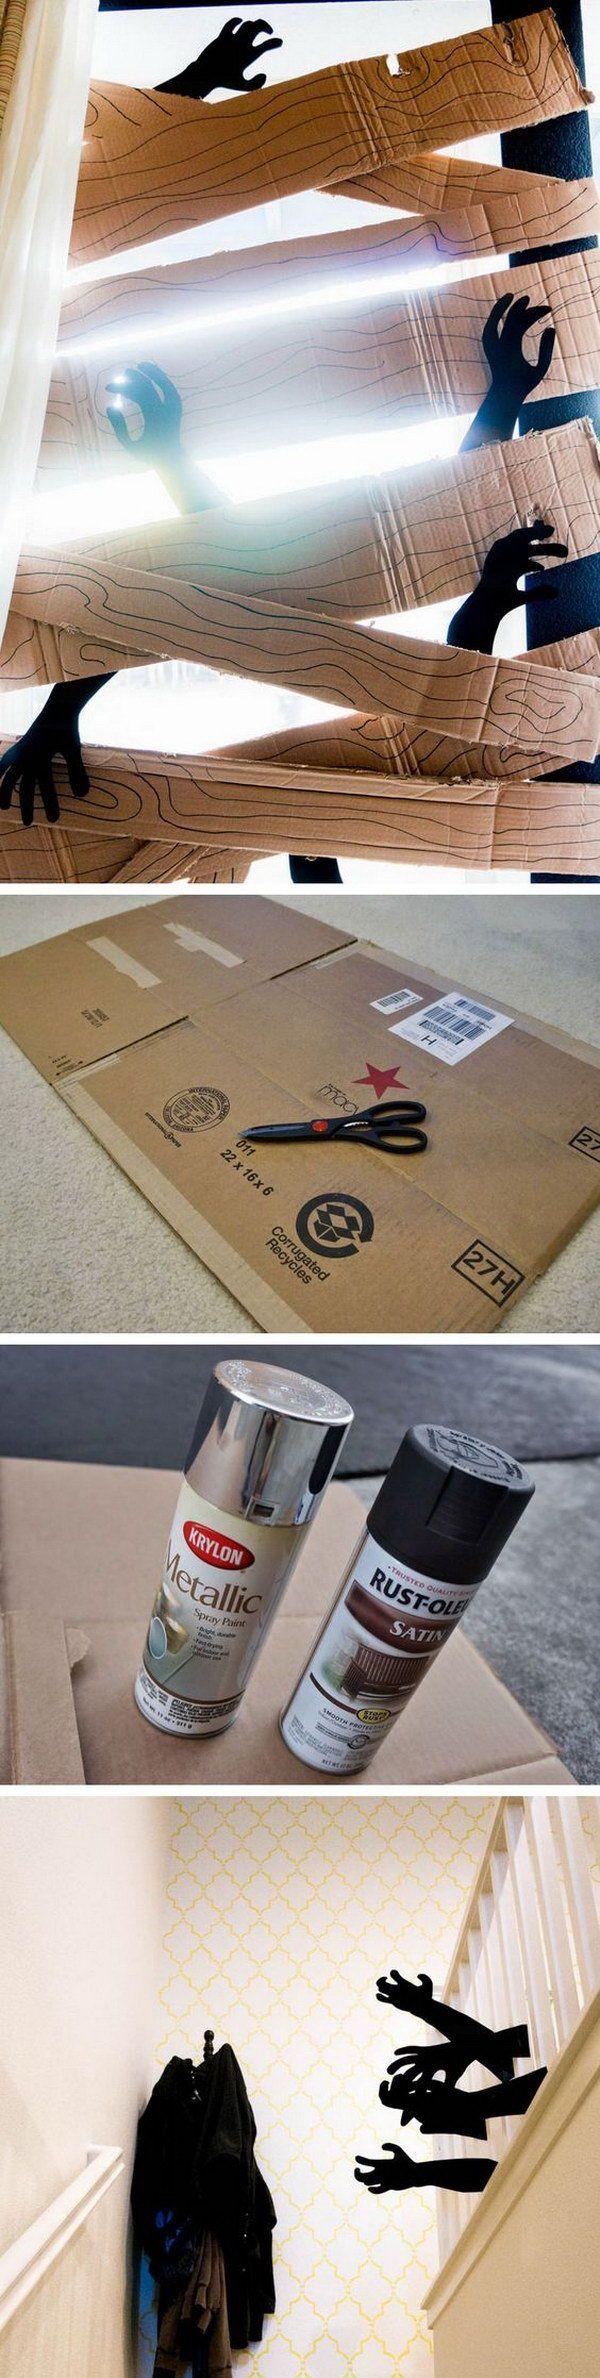 DIY Cardboard Zombie Barricade.